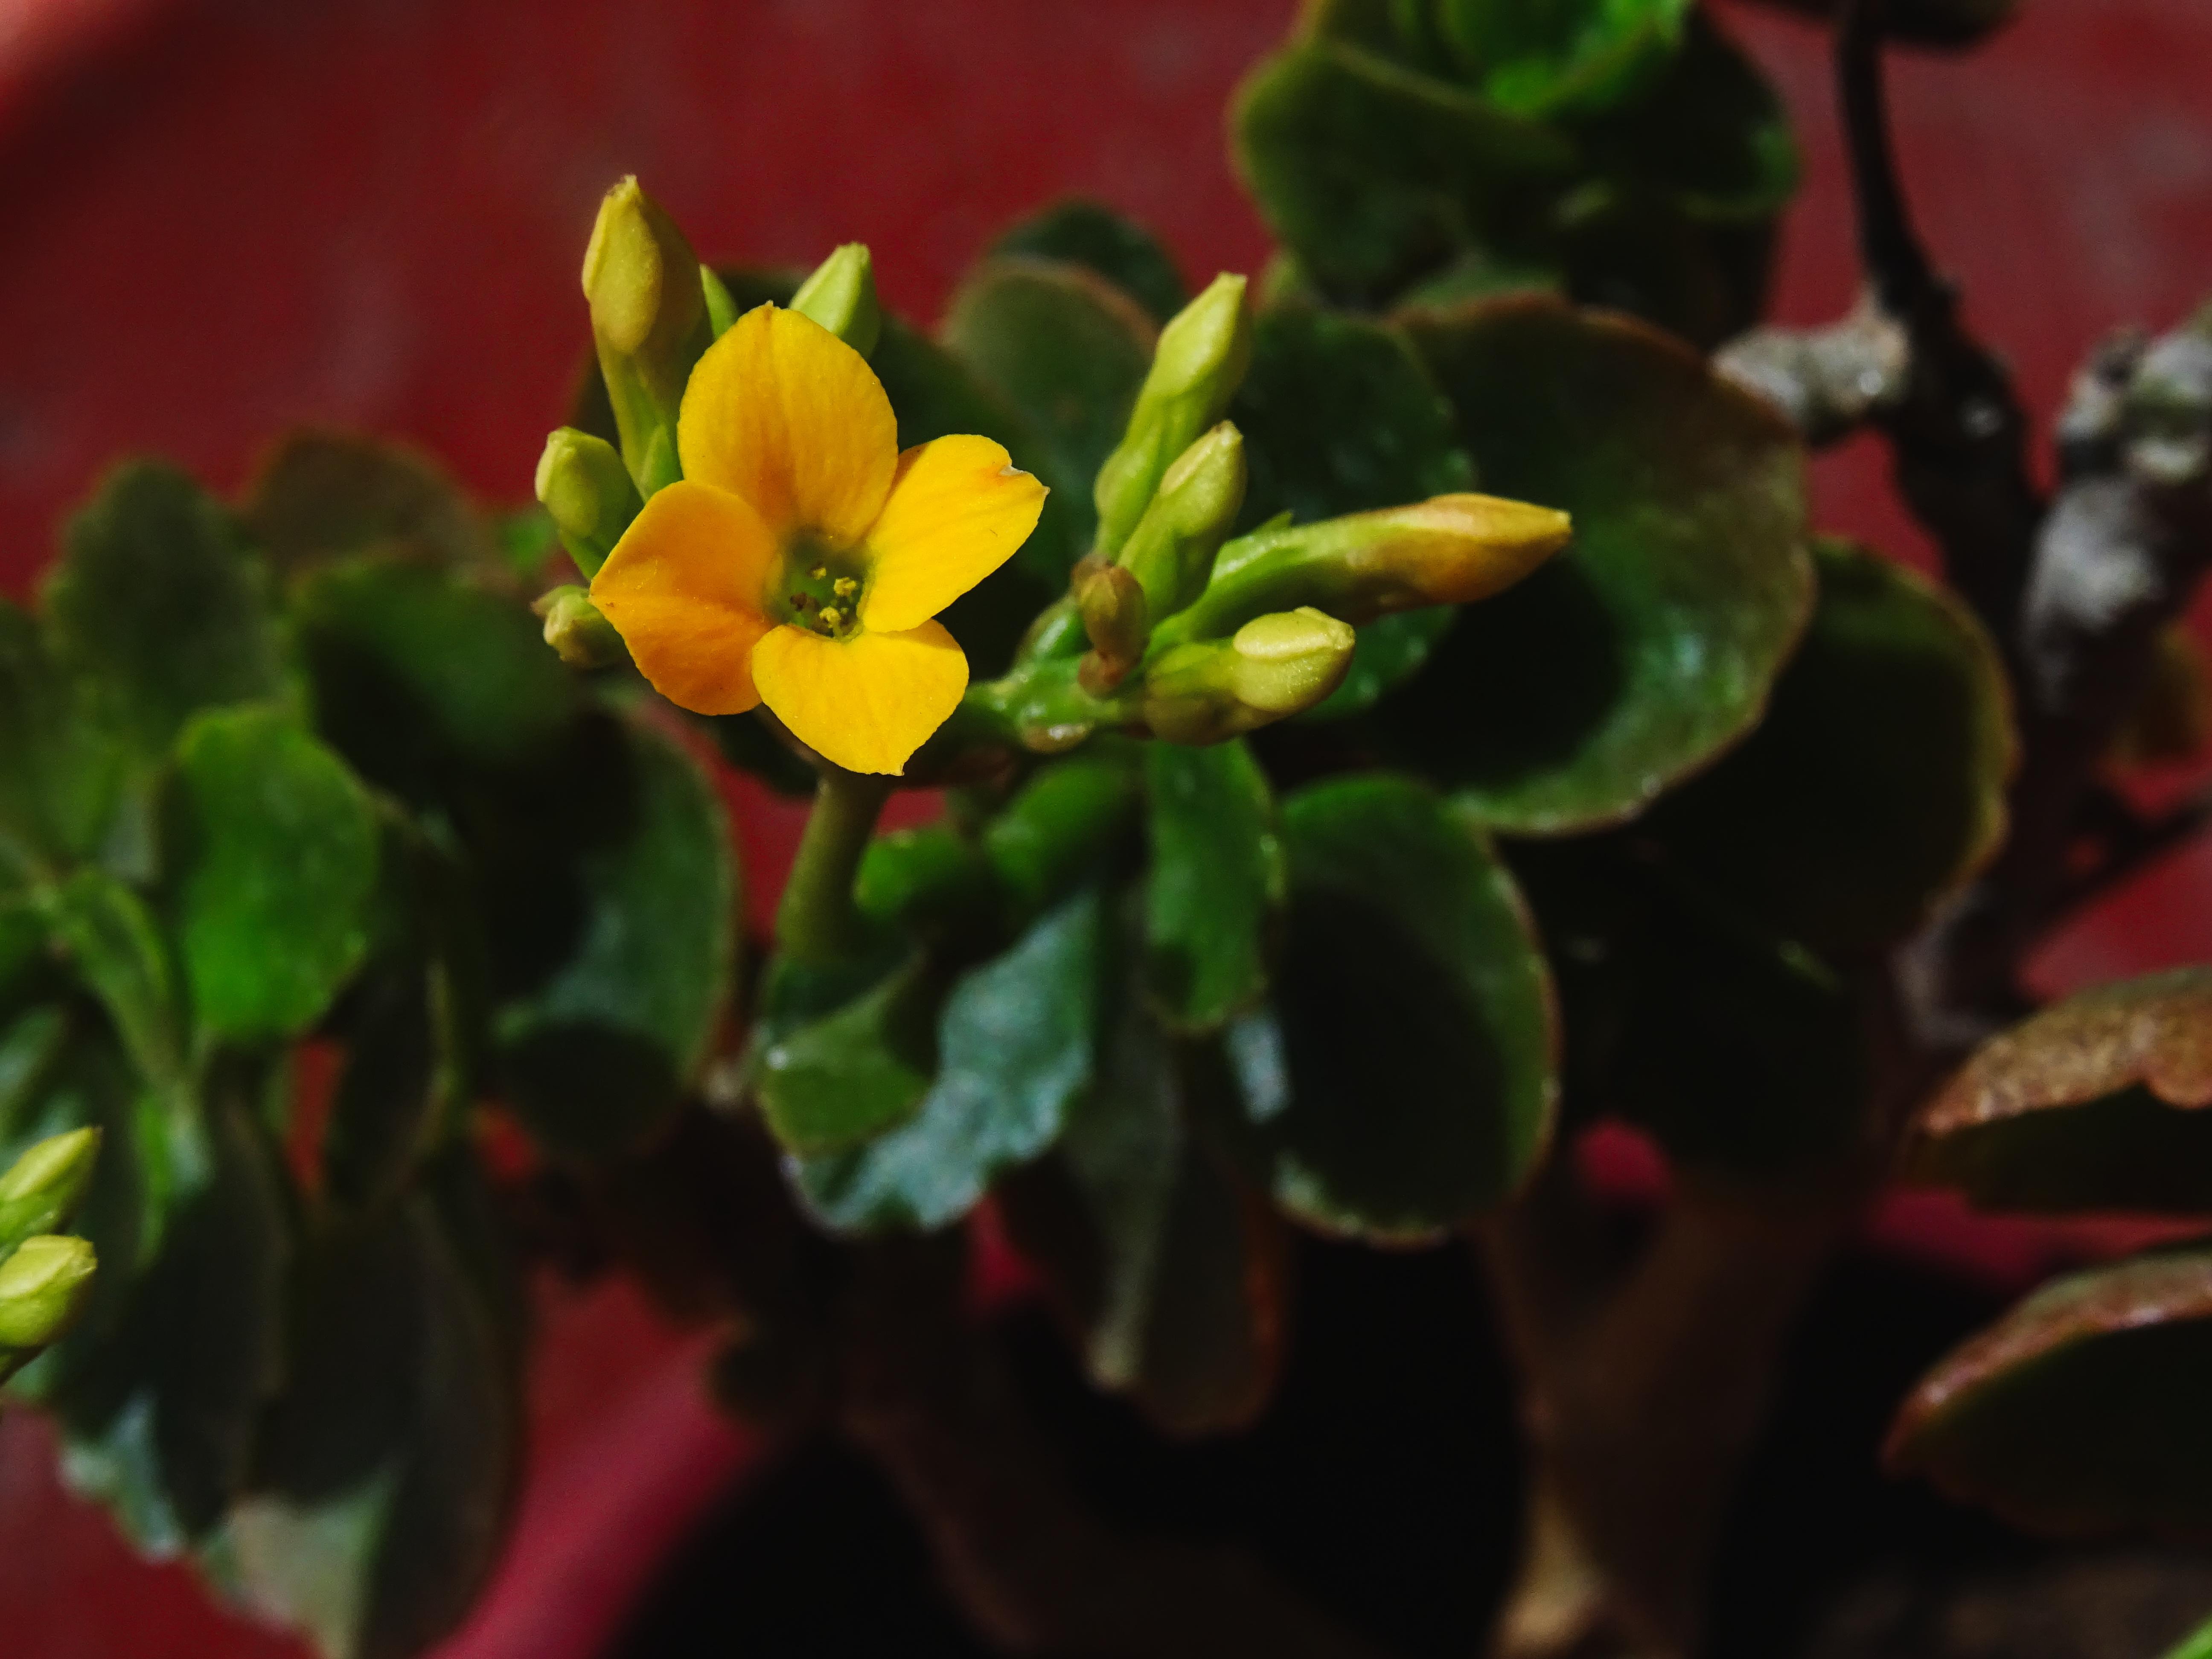 Flaming Katy - Kalanchoe blossfeldiana, Exotic, Flaming, Flower, Leaf, HQ Photo